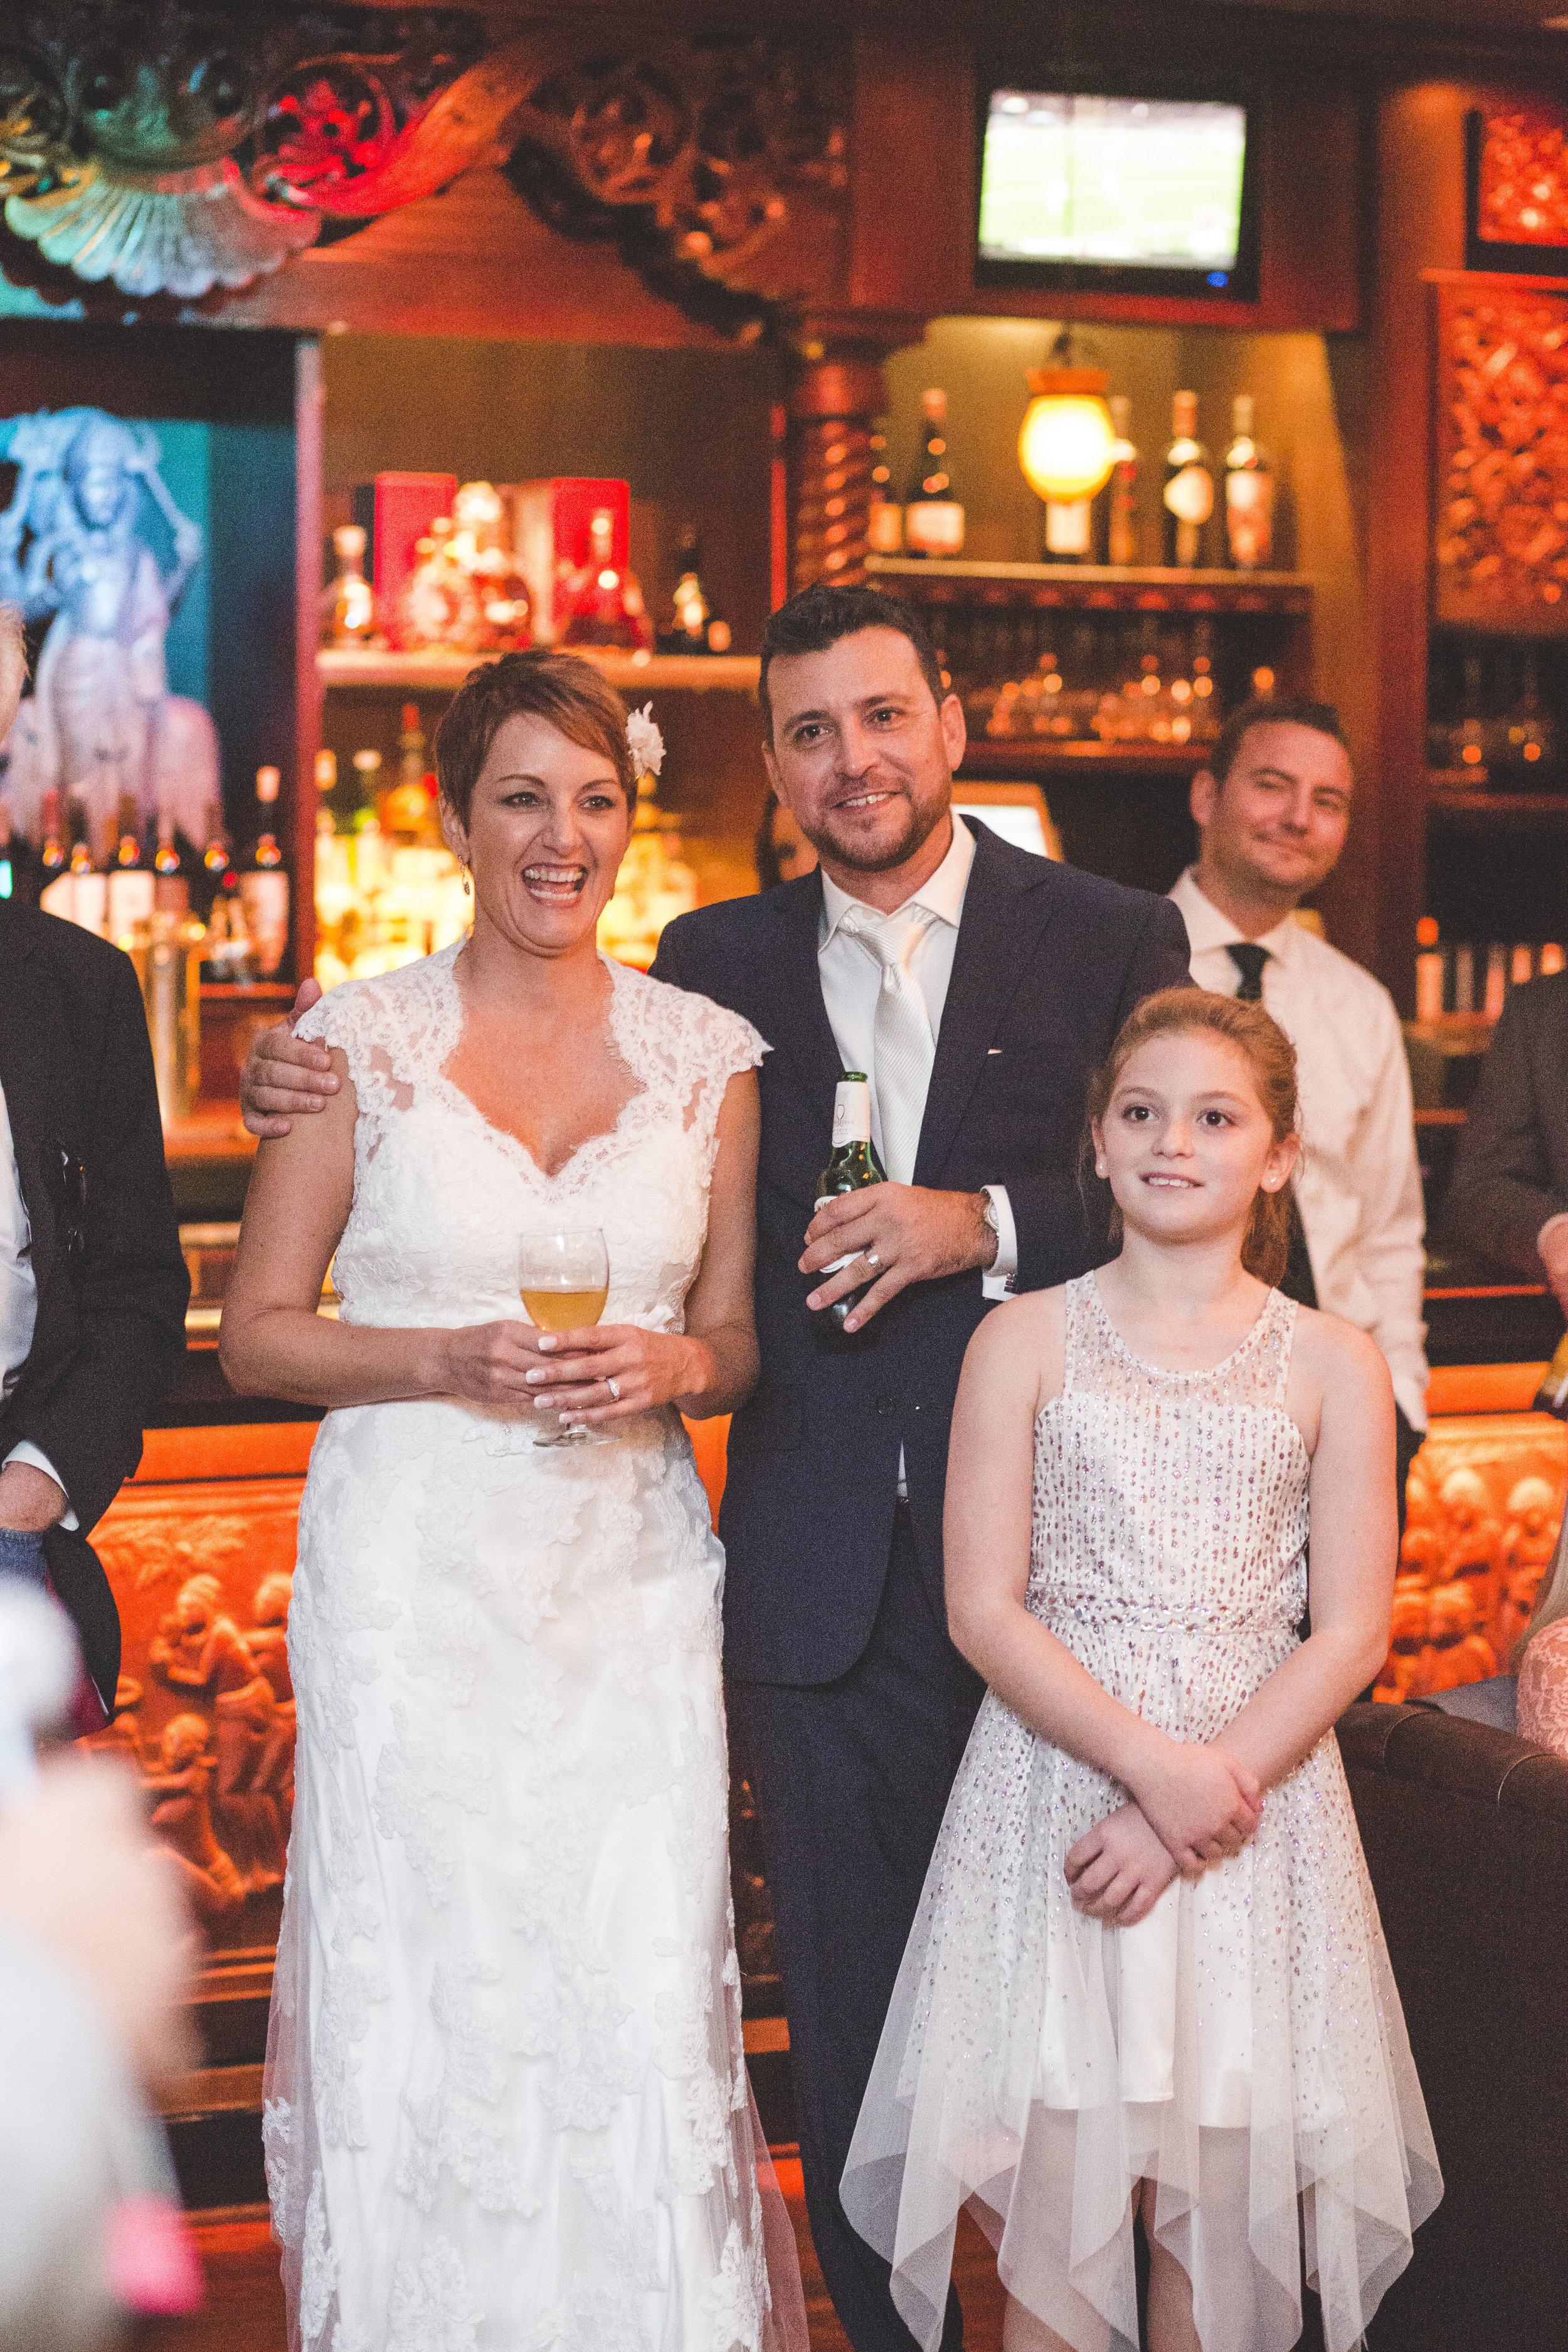 ATGI_Kat and Gabe Wedding 2016_2S8A5803.jpg